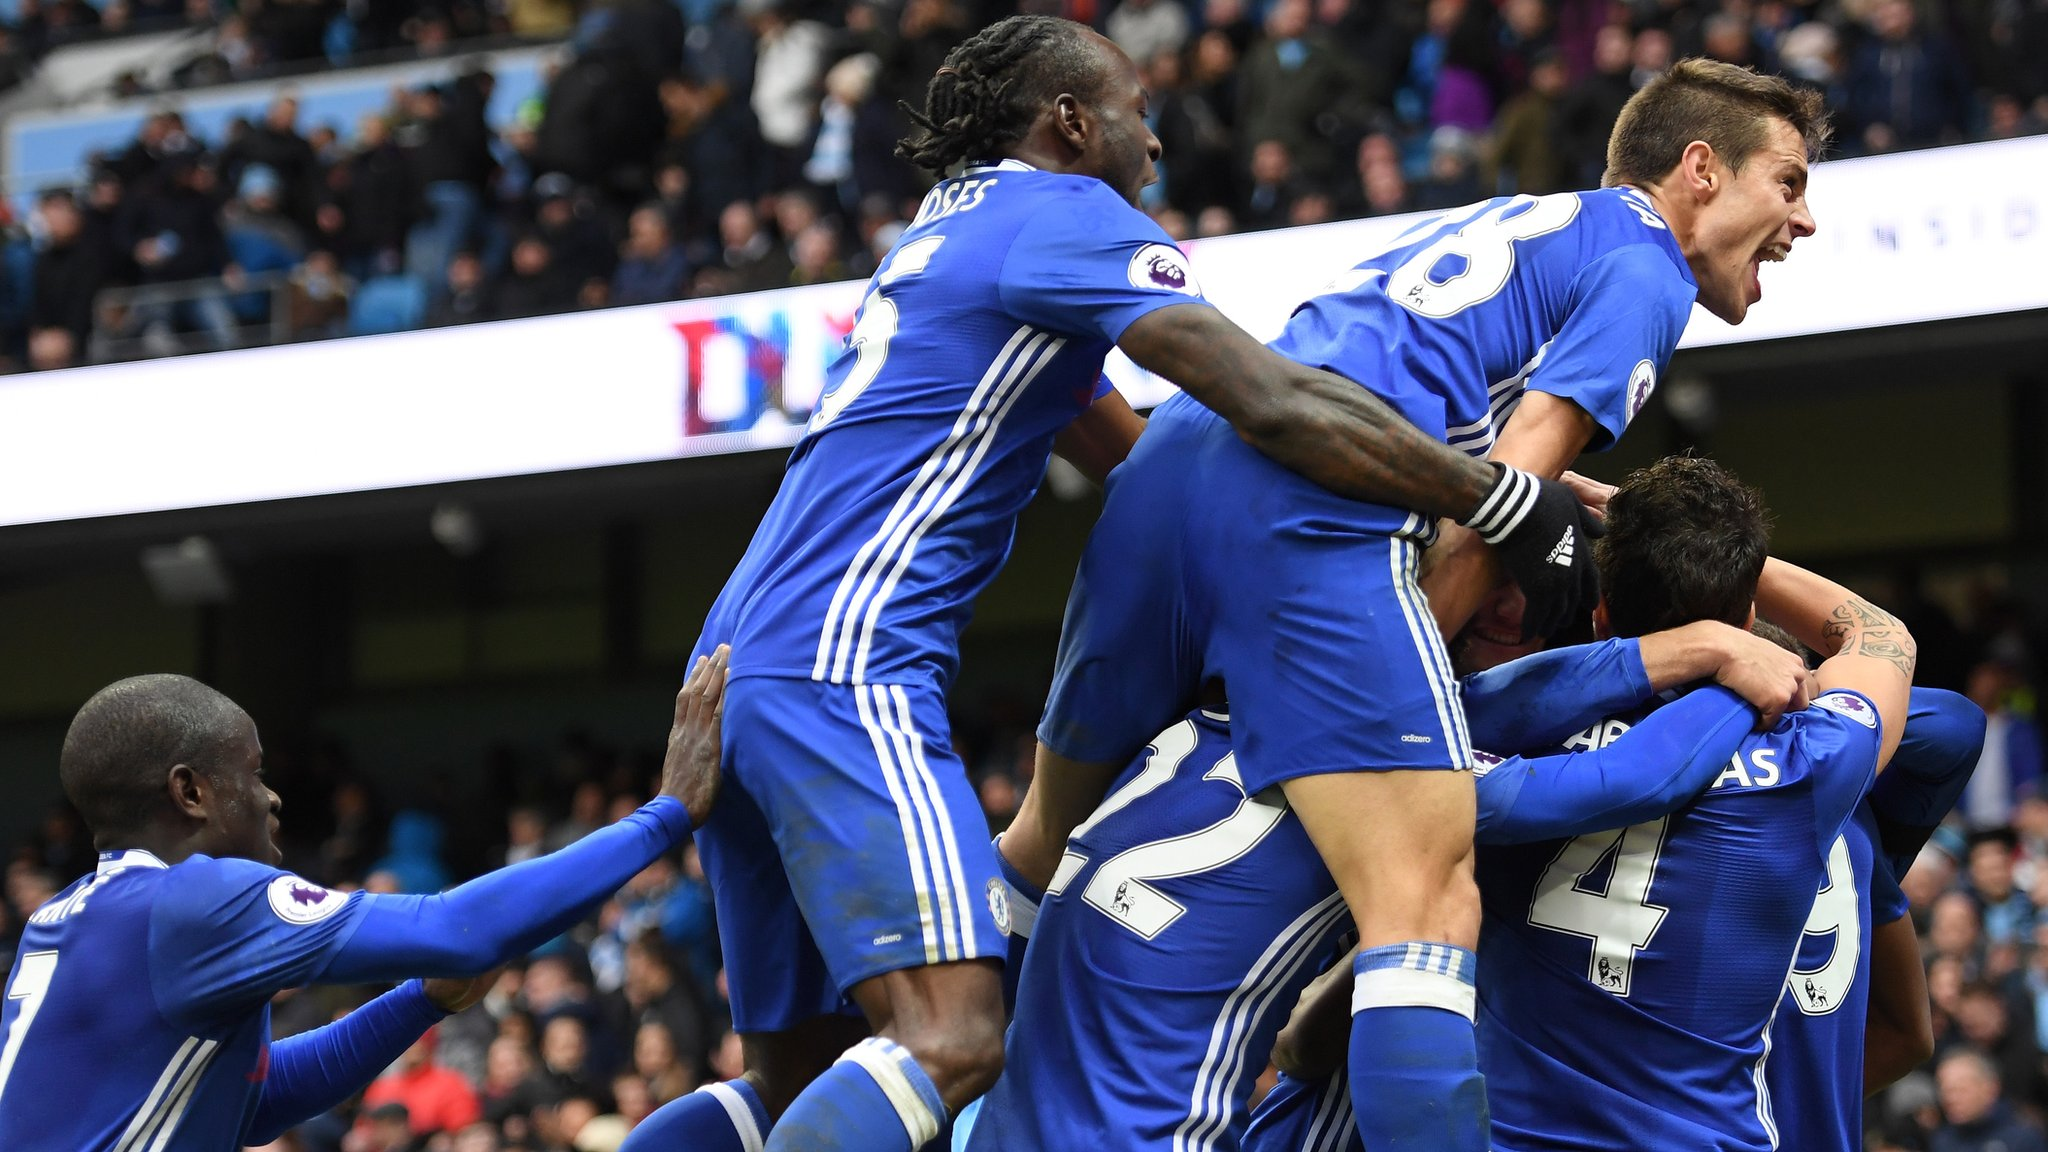 Manchester City 3-1 Chelsea